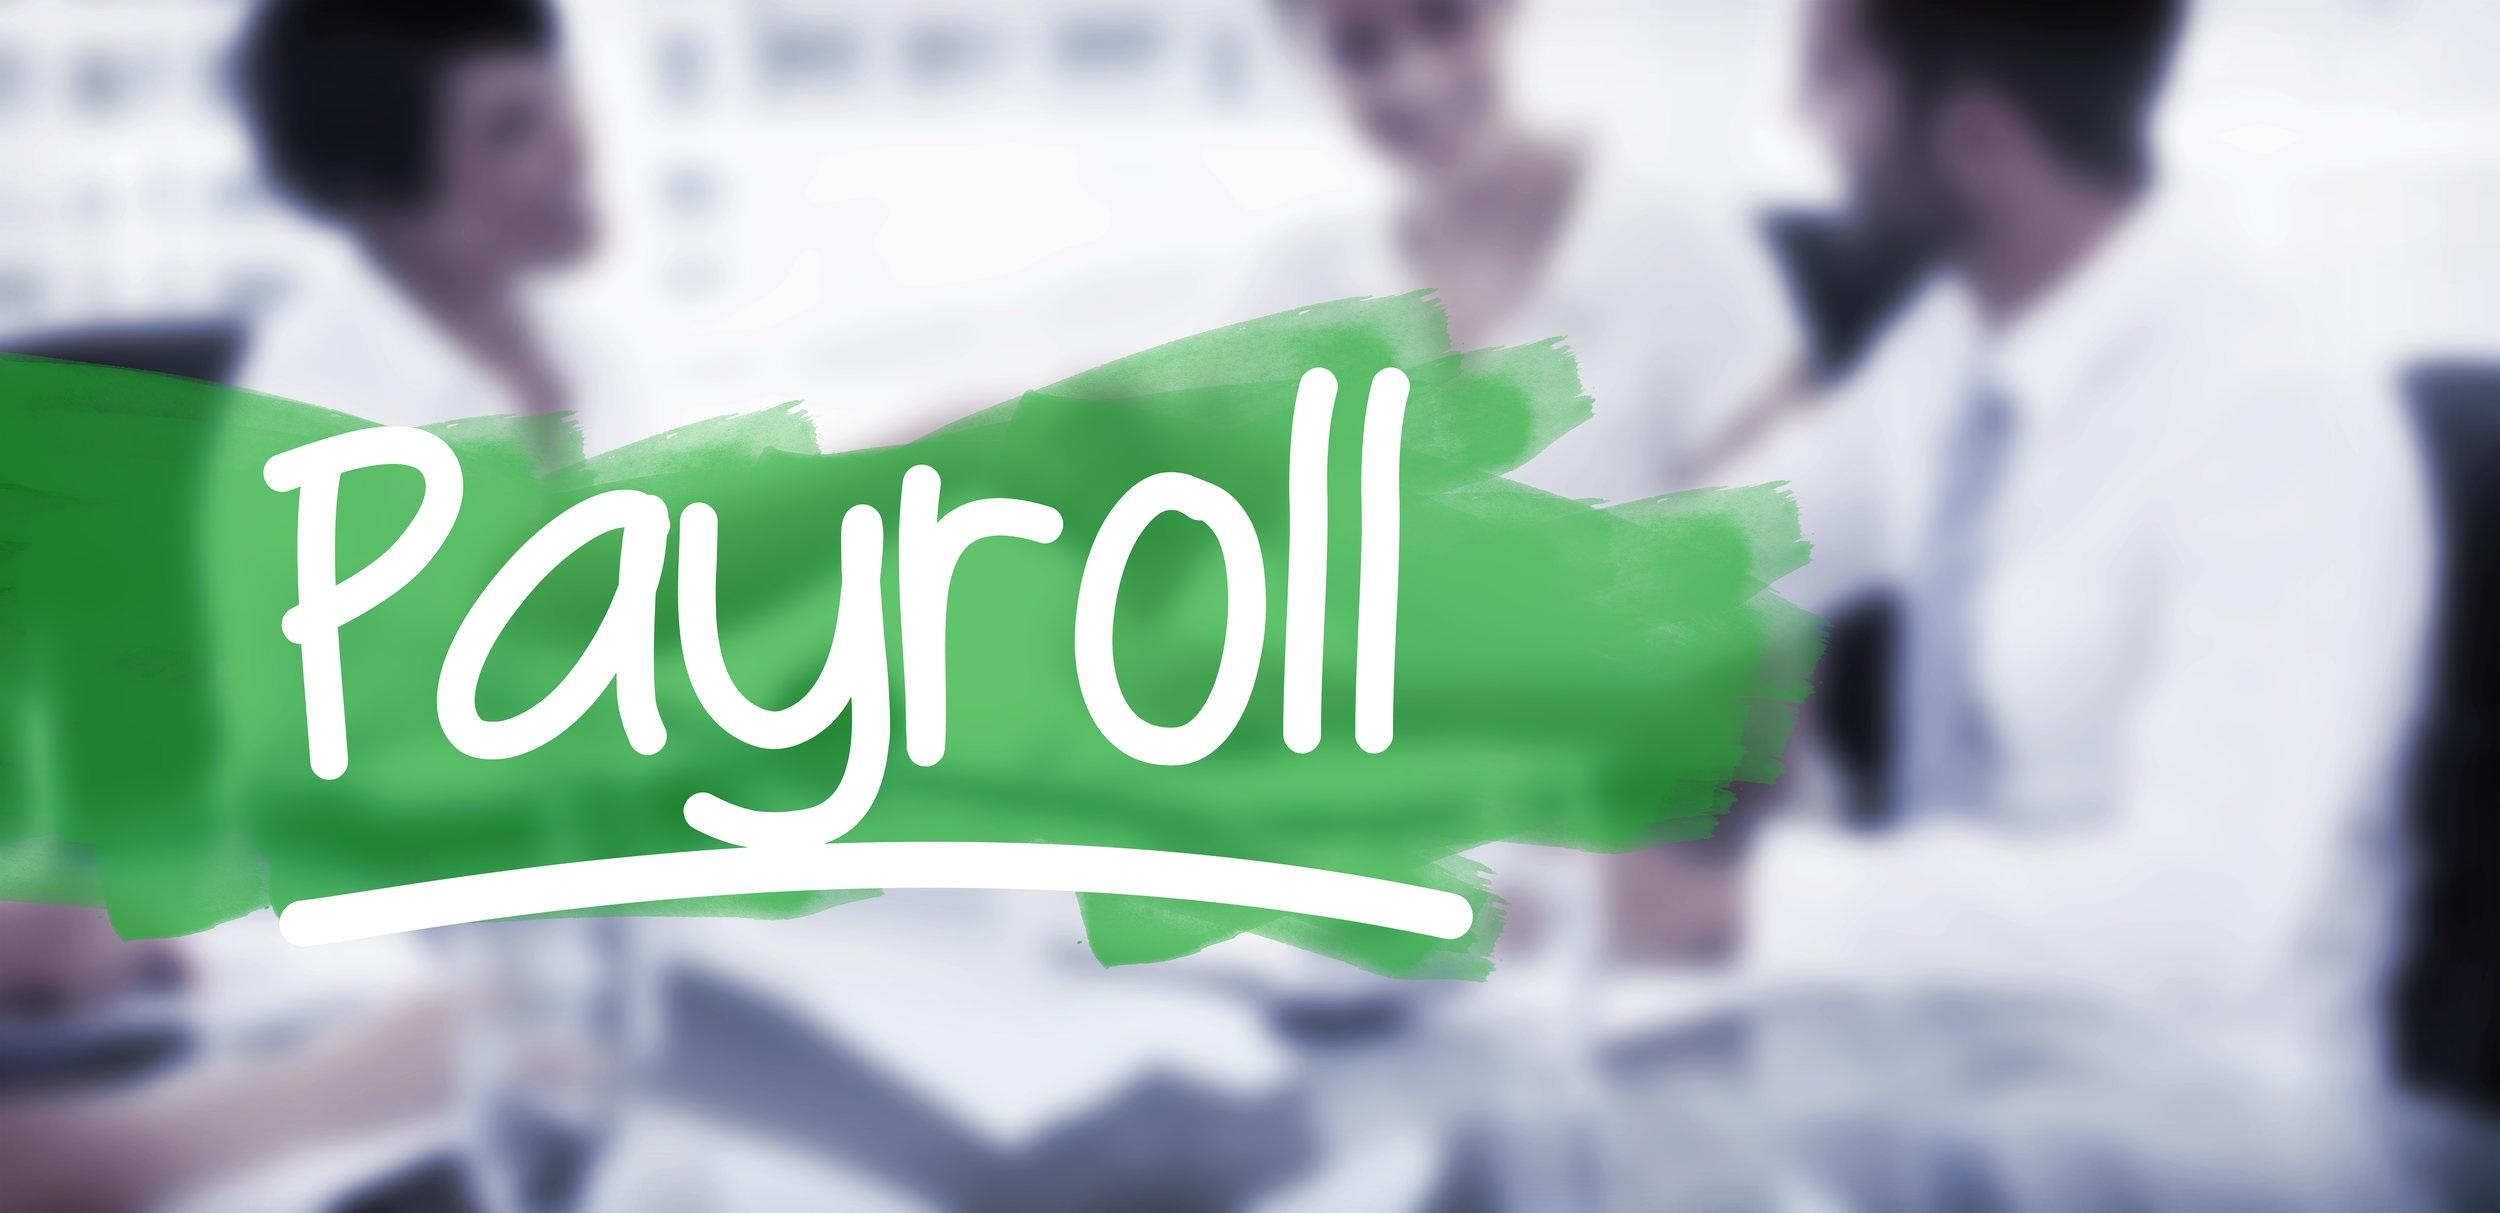 Behind-on-Payroll-tax.jpg